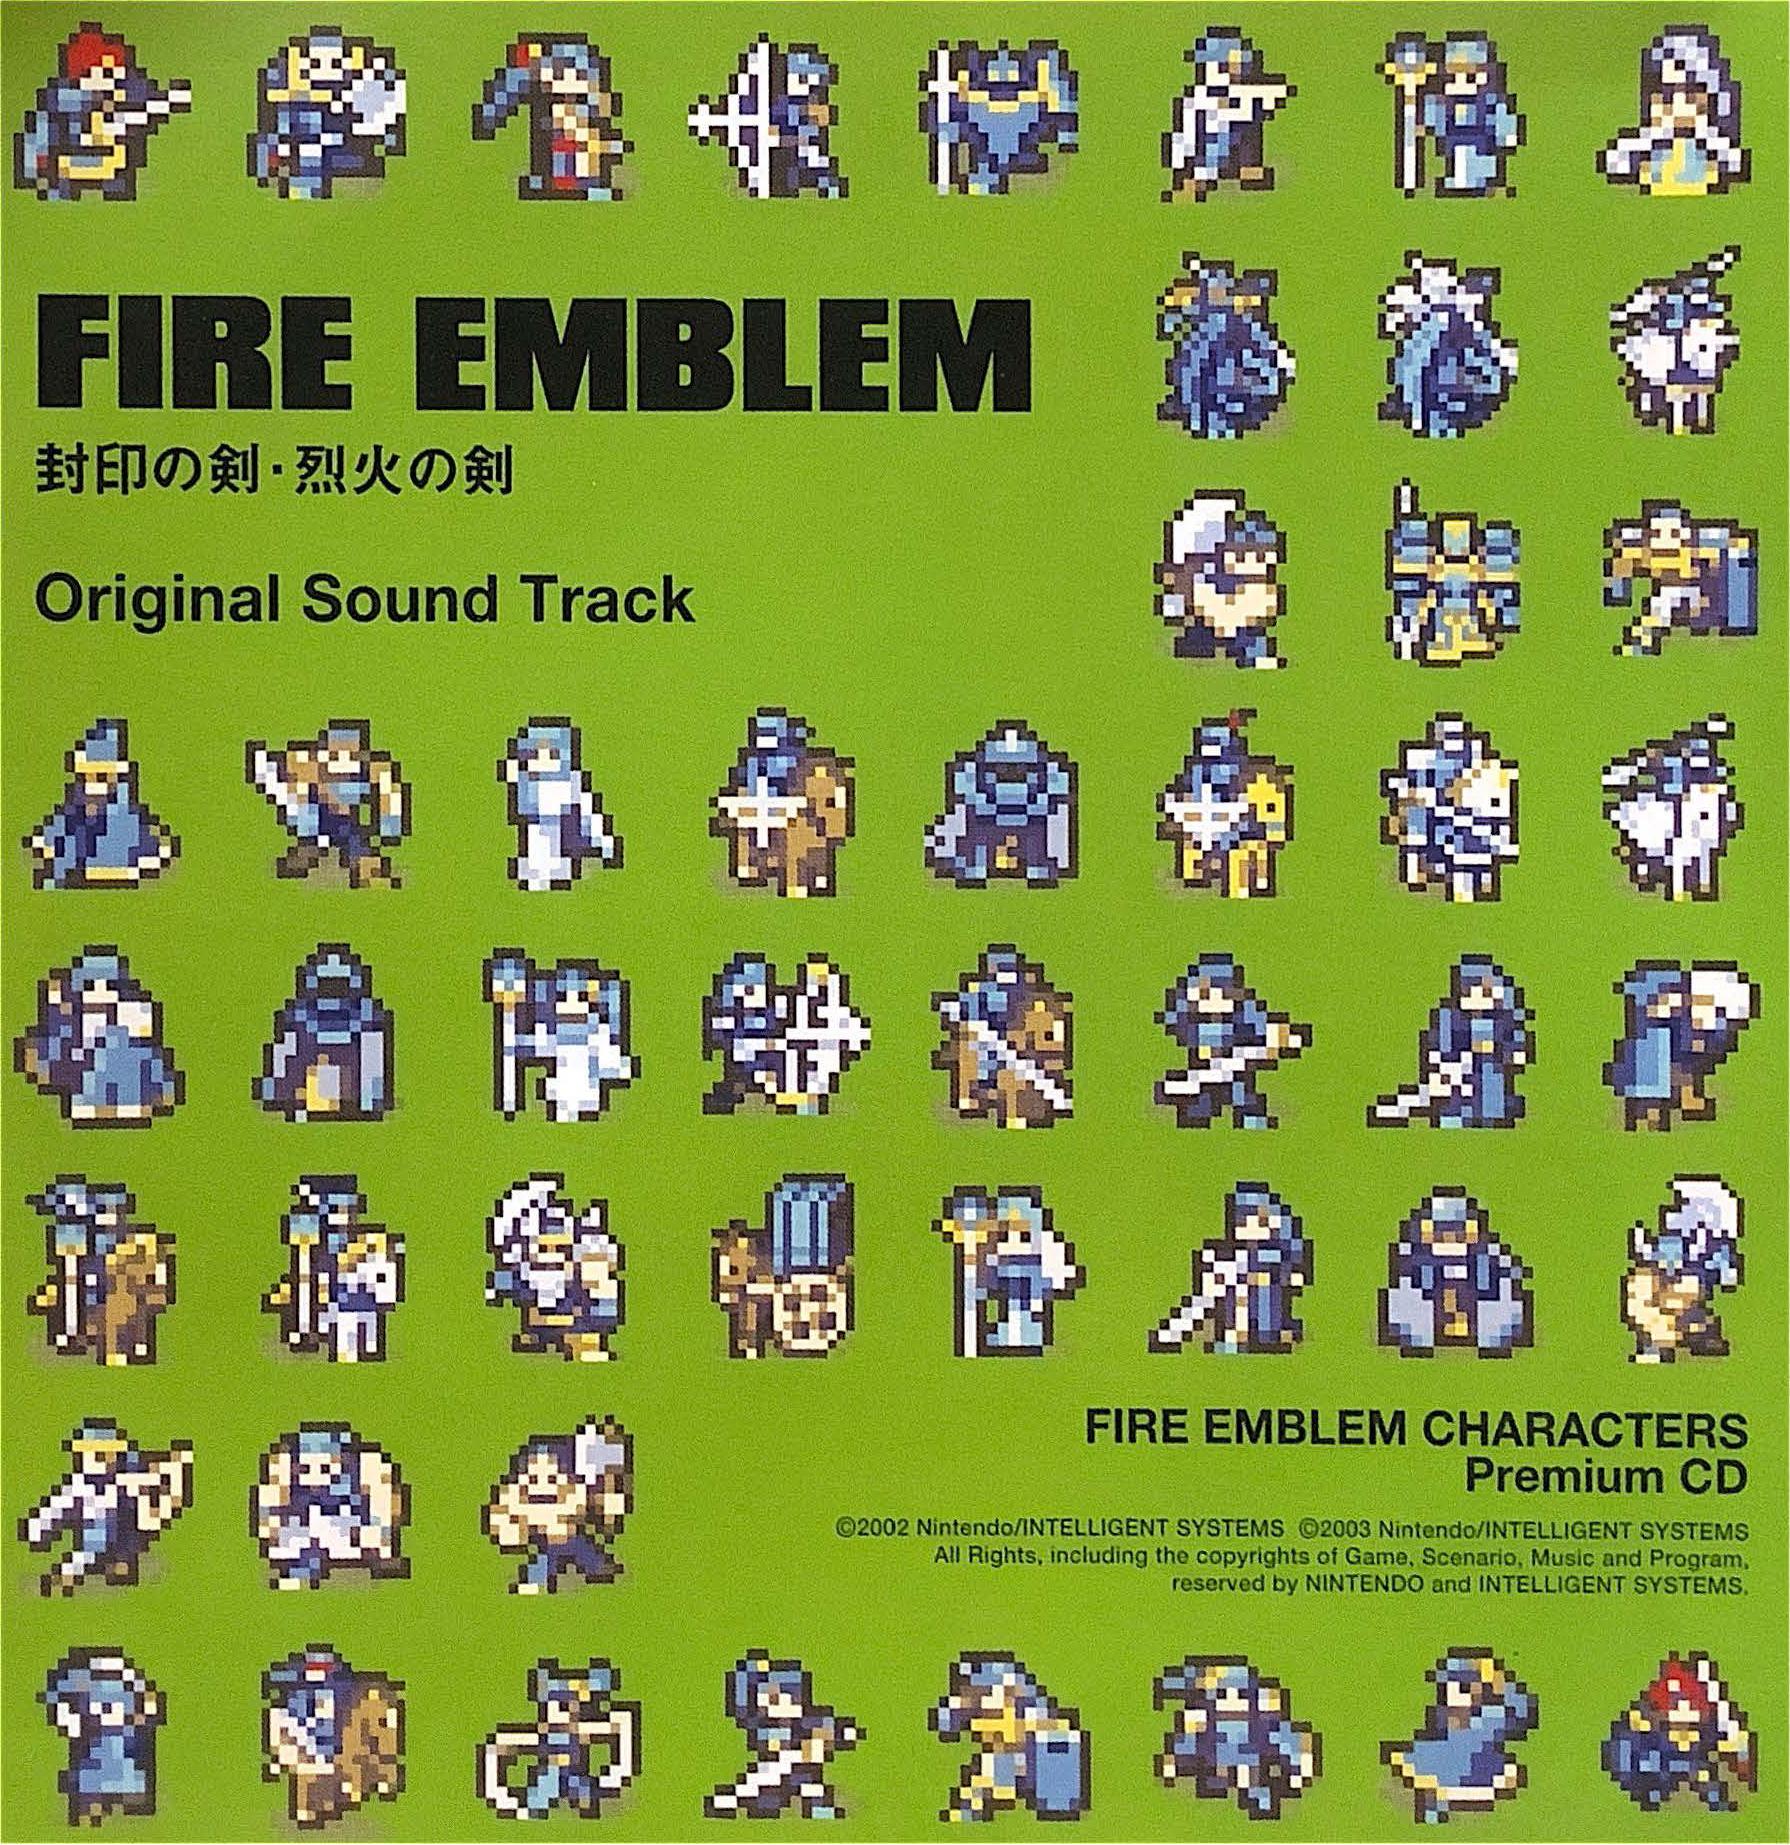 Fire Emblem 6 & 7 Premium Soundtrack